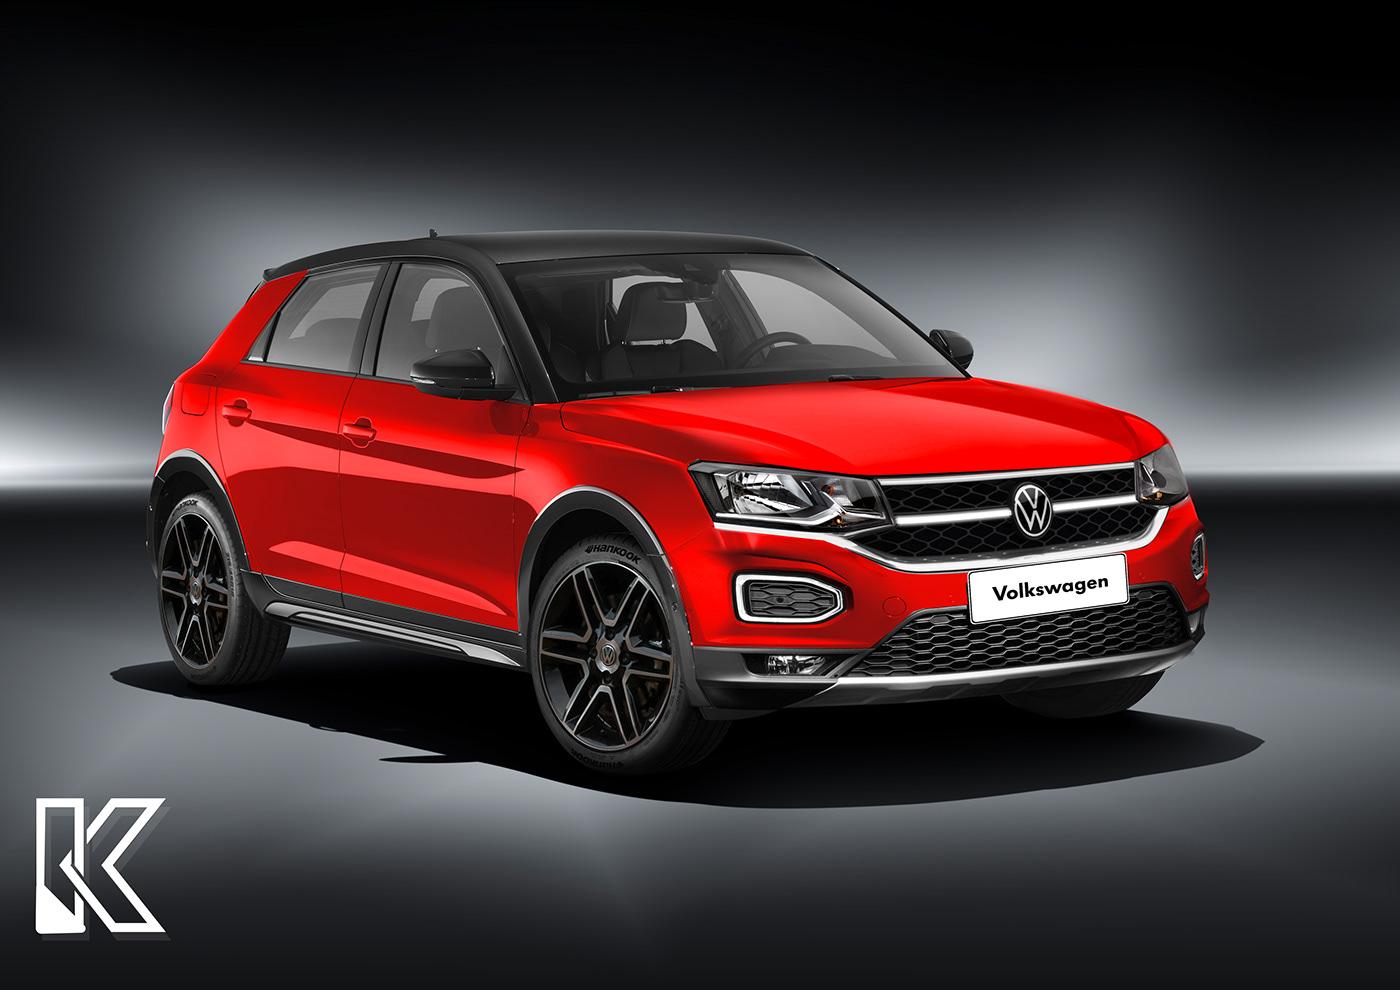 automotive rendering